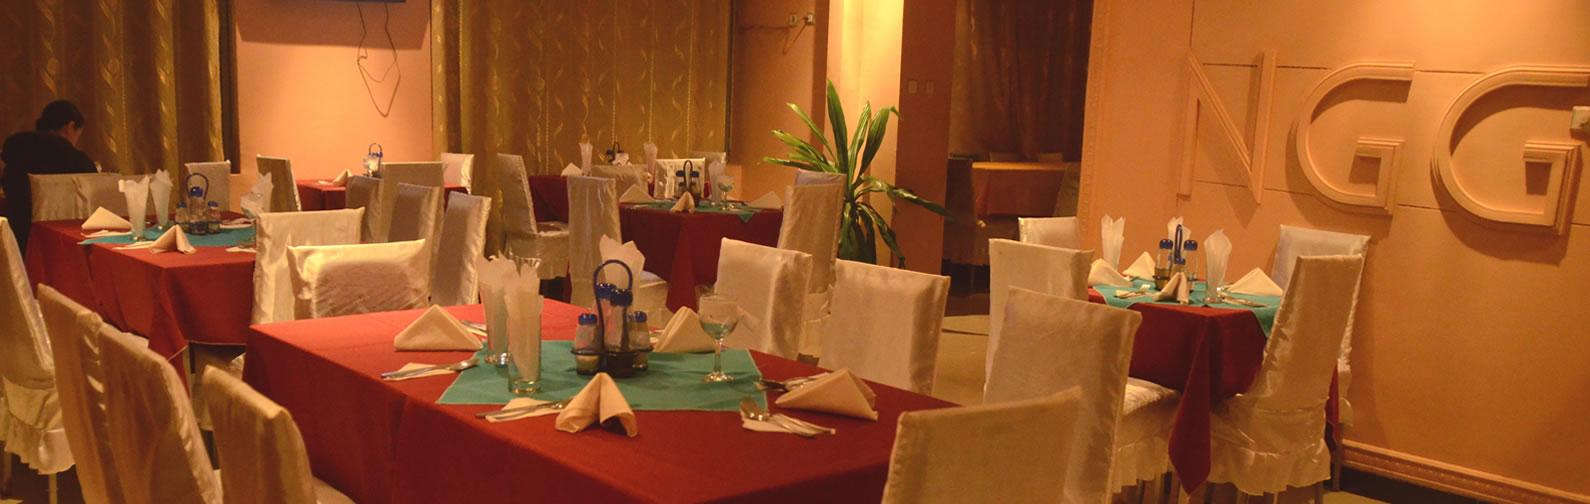 NGG Hotel Restaurant